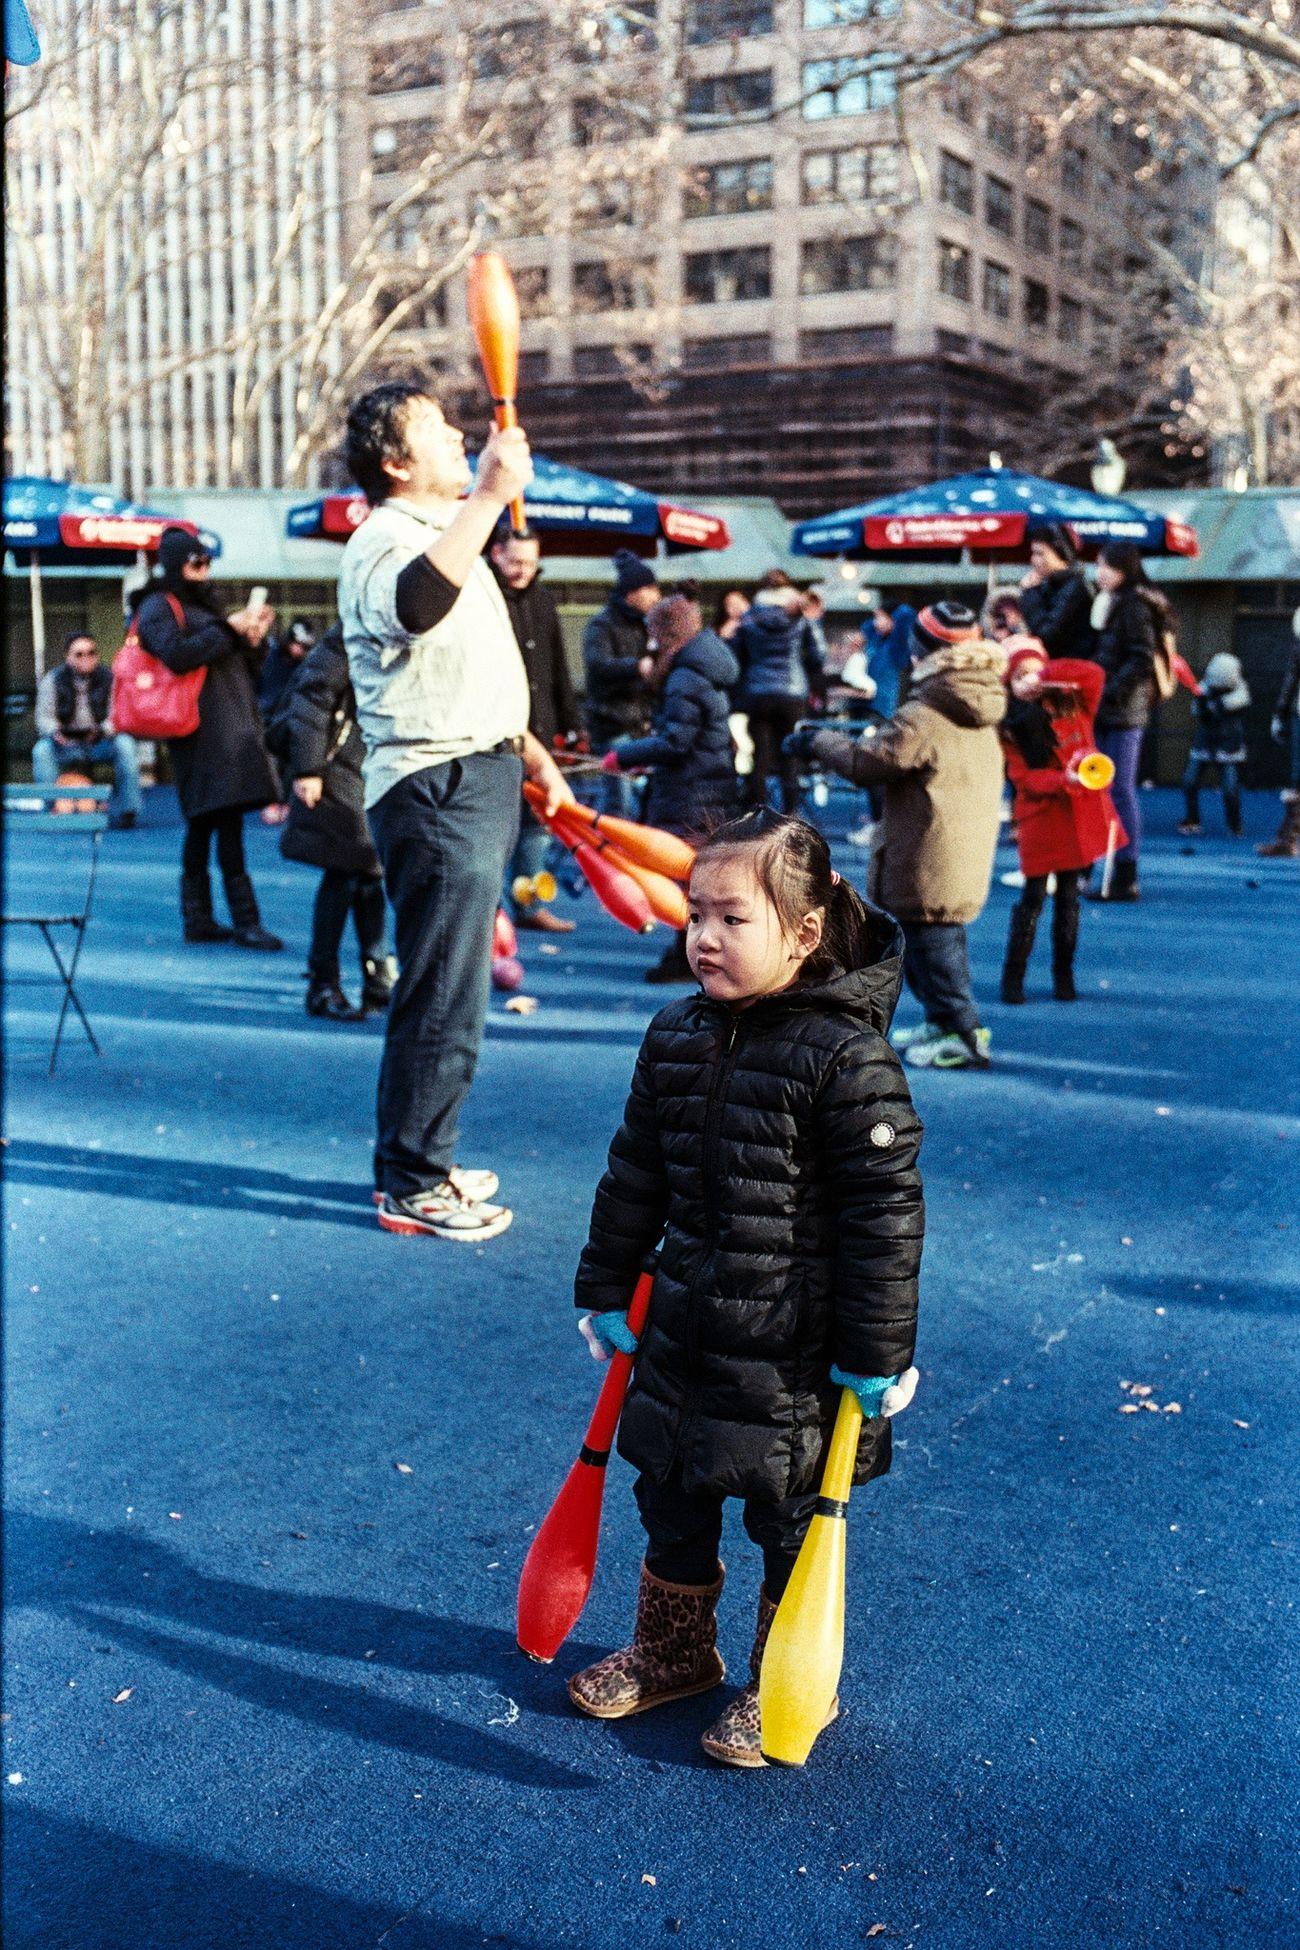 Streetphotography Fujifilm Fuji Superia X-Tra 400 Leica Leicam6 Newyork Children Juggler